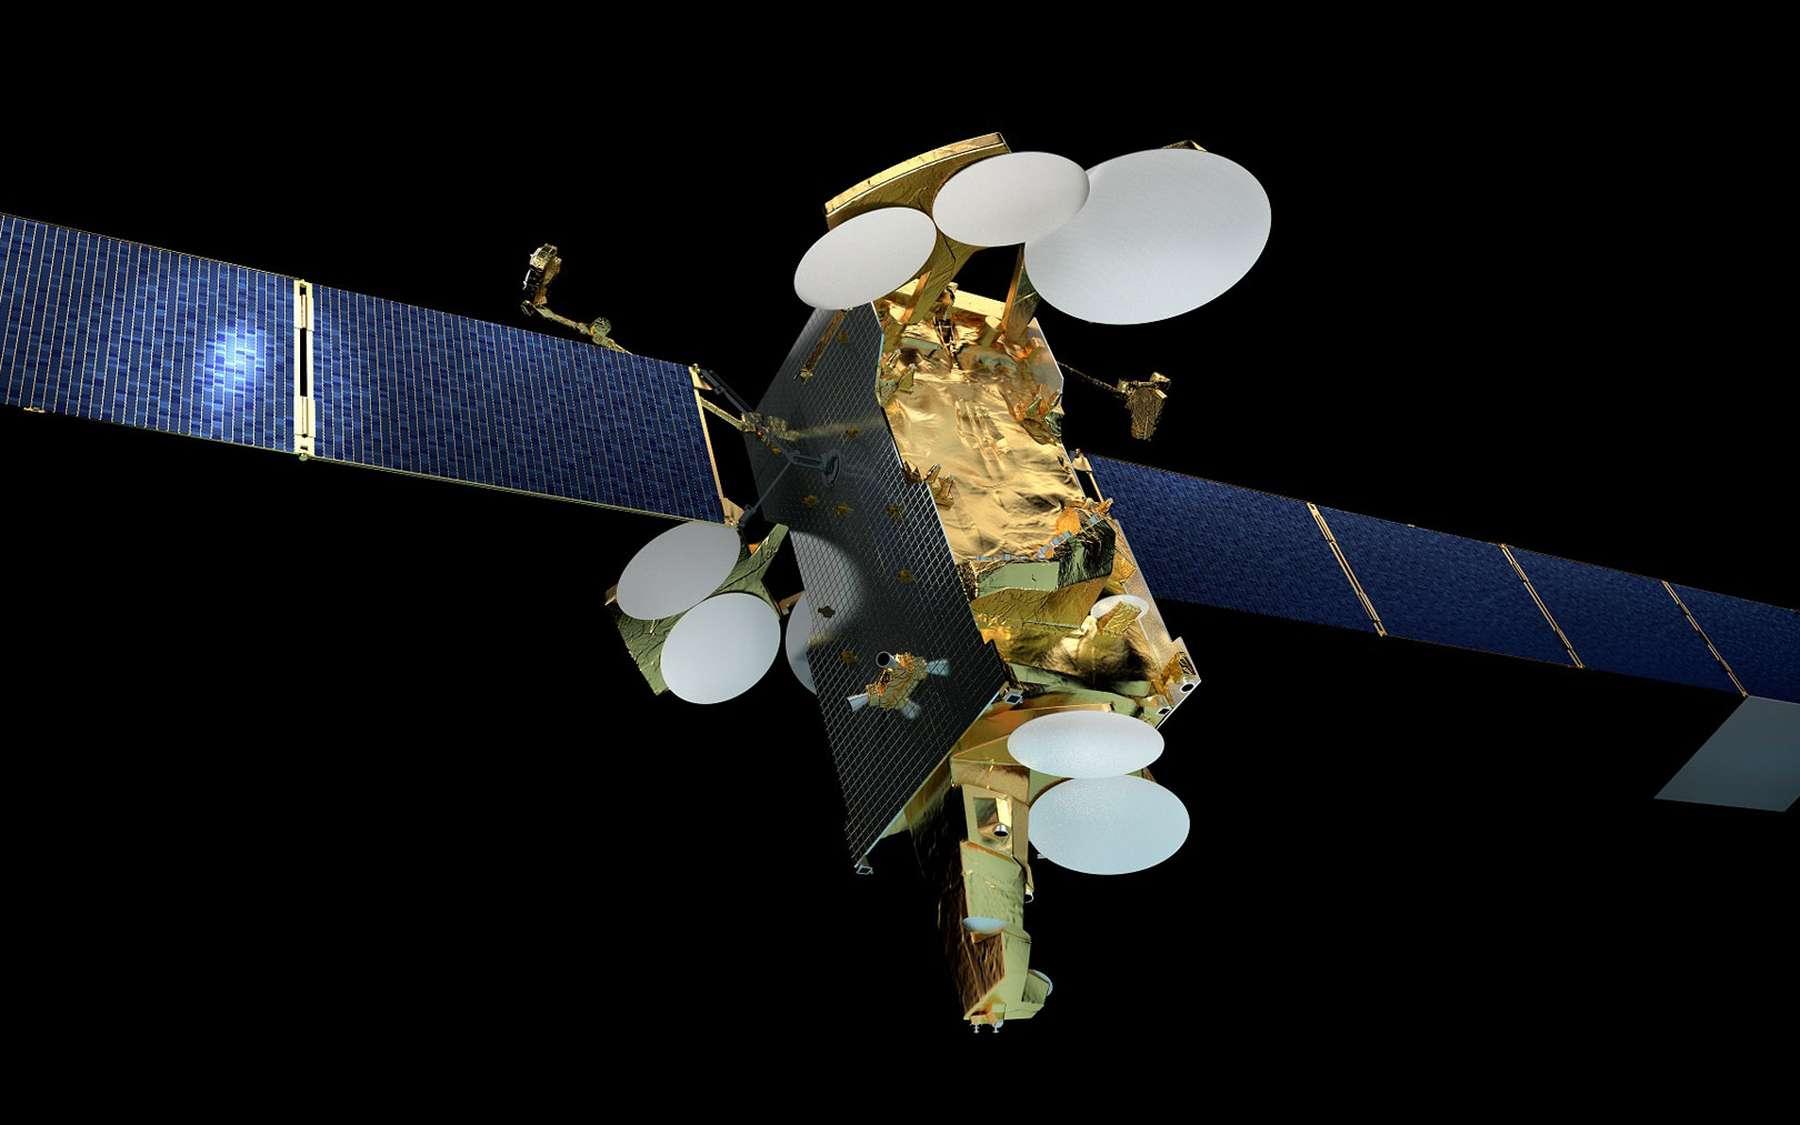 Vue d'artiste du satellite SES-12. © Airbus Defence and Space, SAS 2014